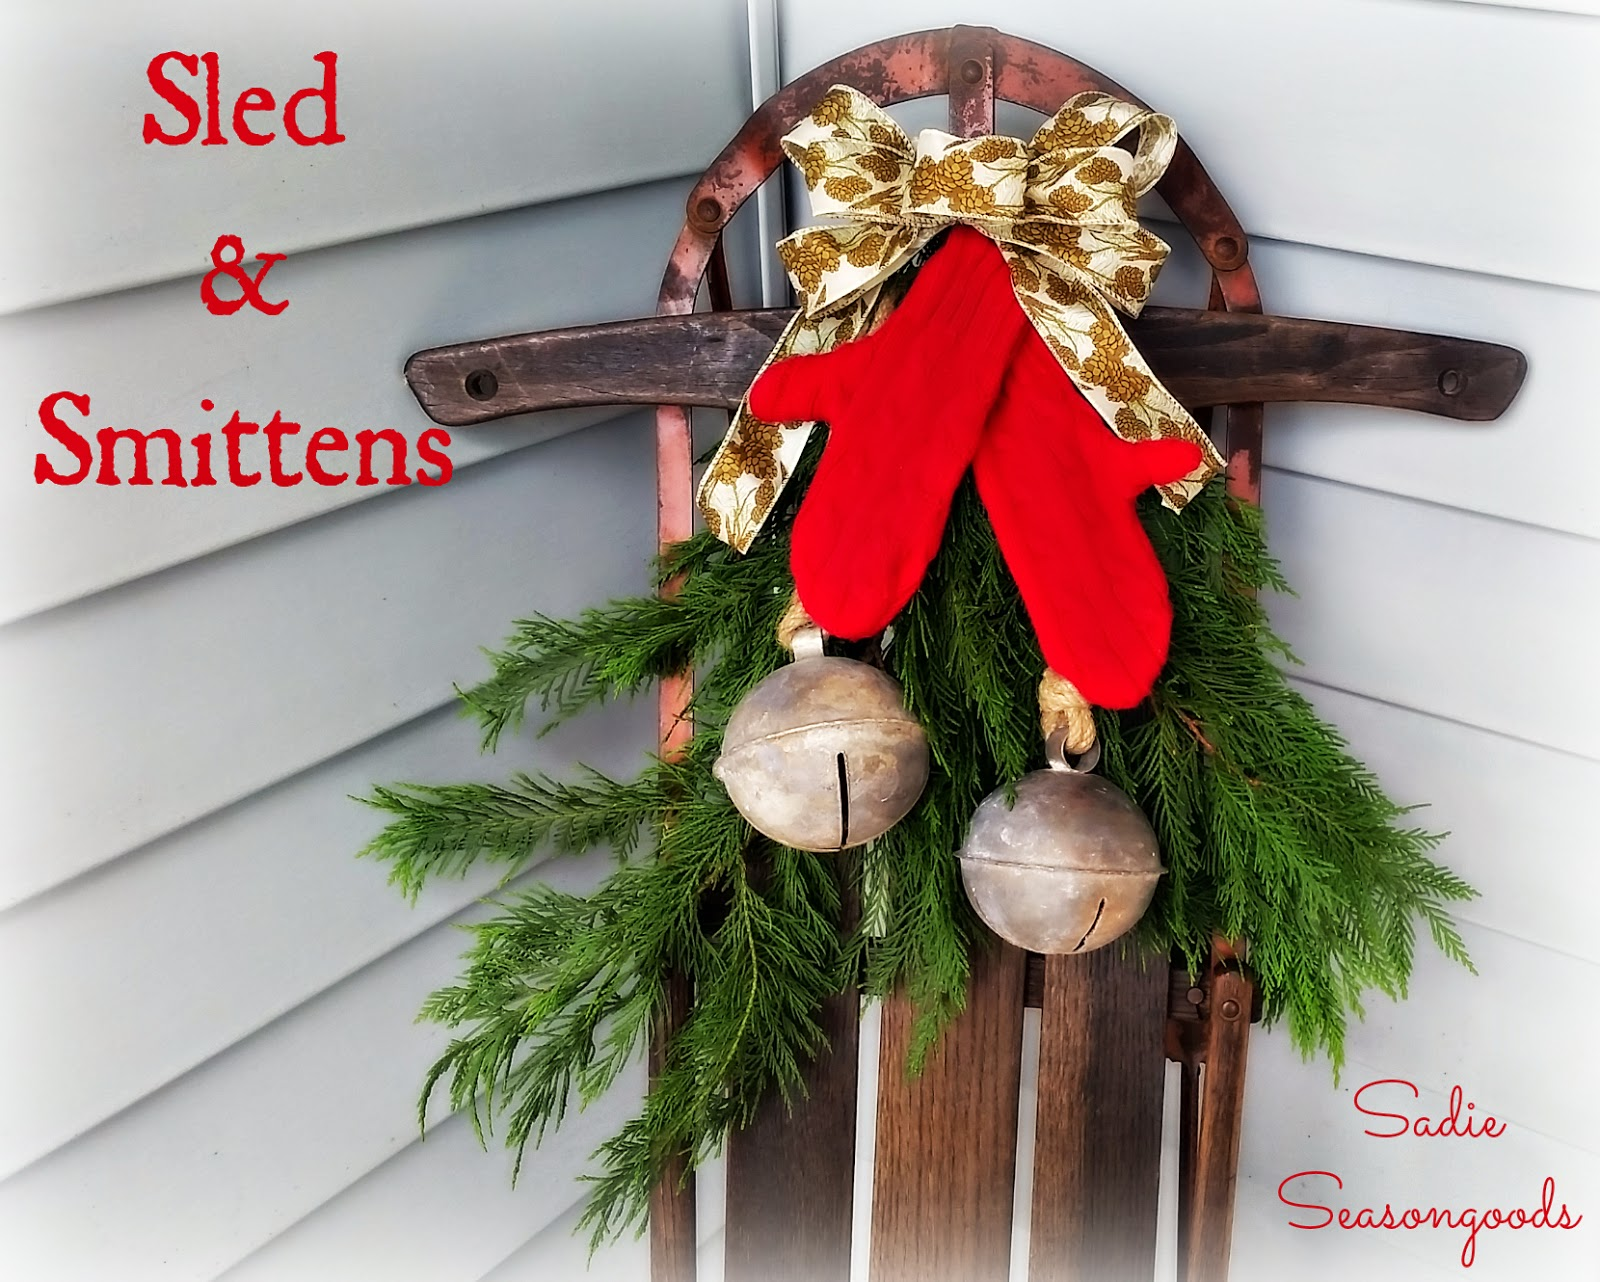 Sled & Smittens, shared by Sadie Seasongoods